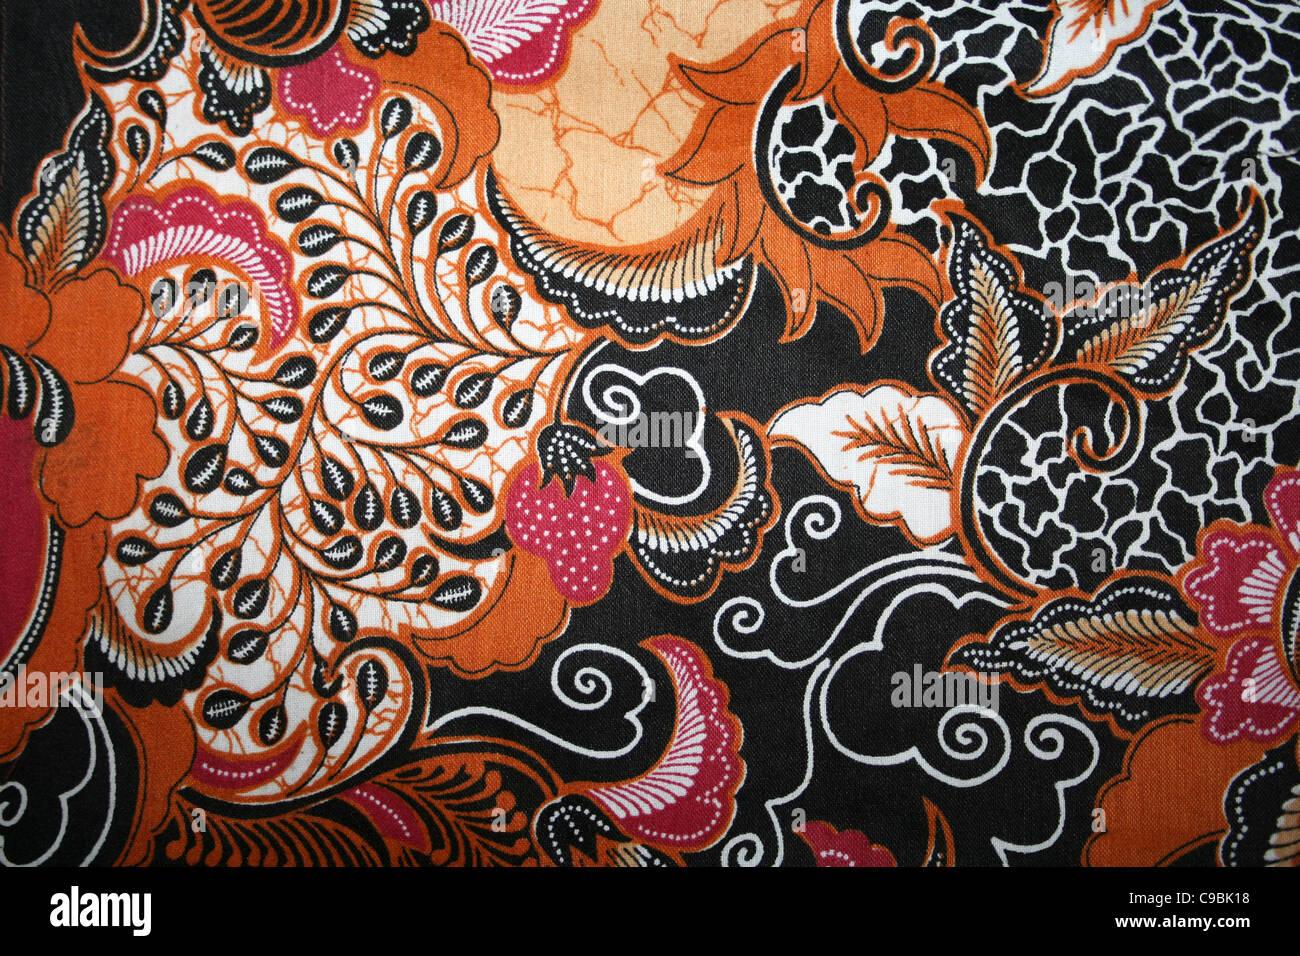 Batik From Indonesia Stock Photos  Batik From Indonesia